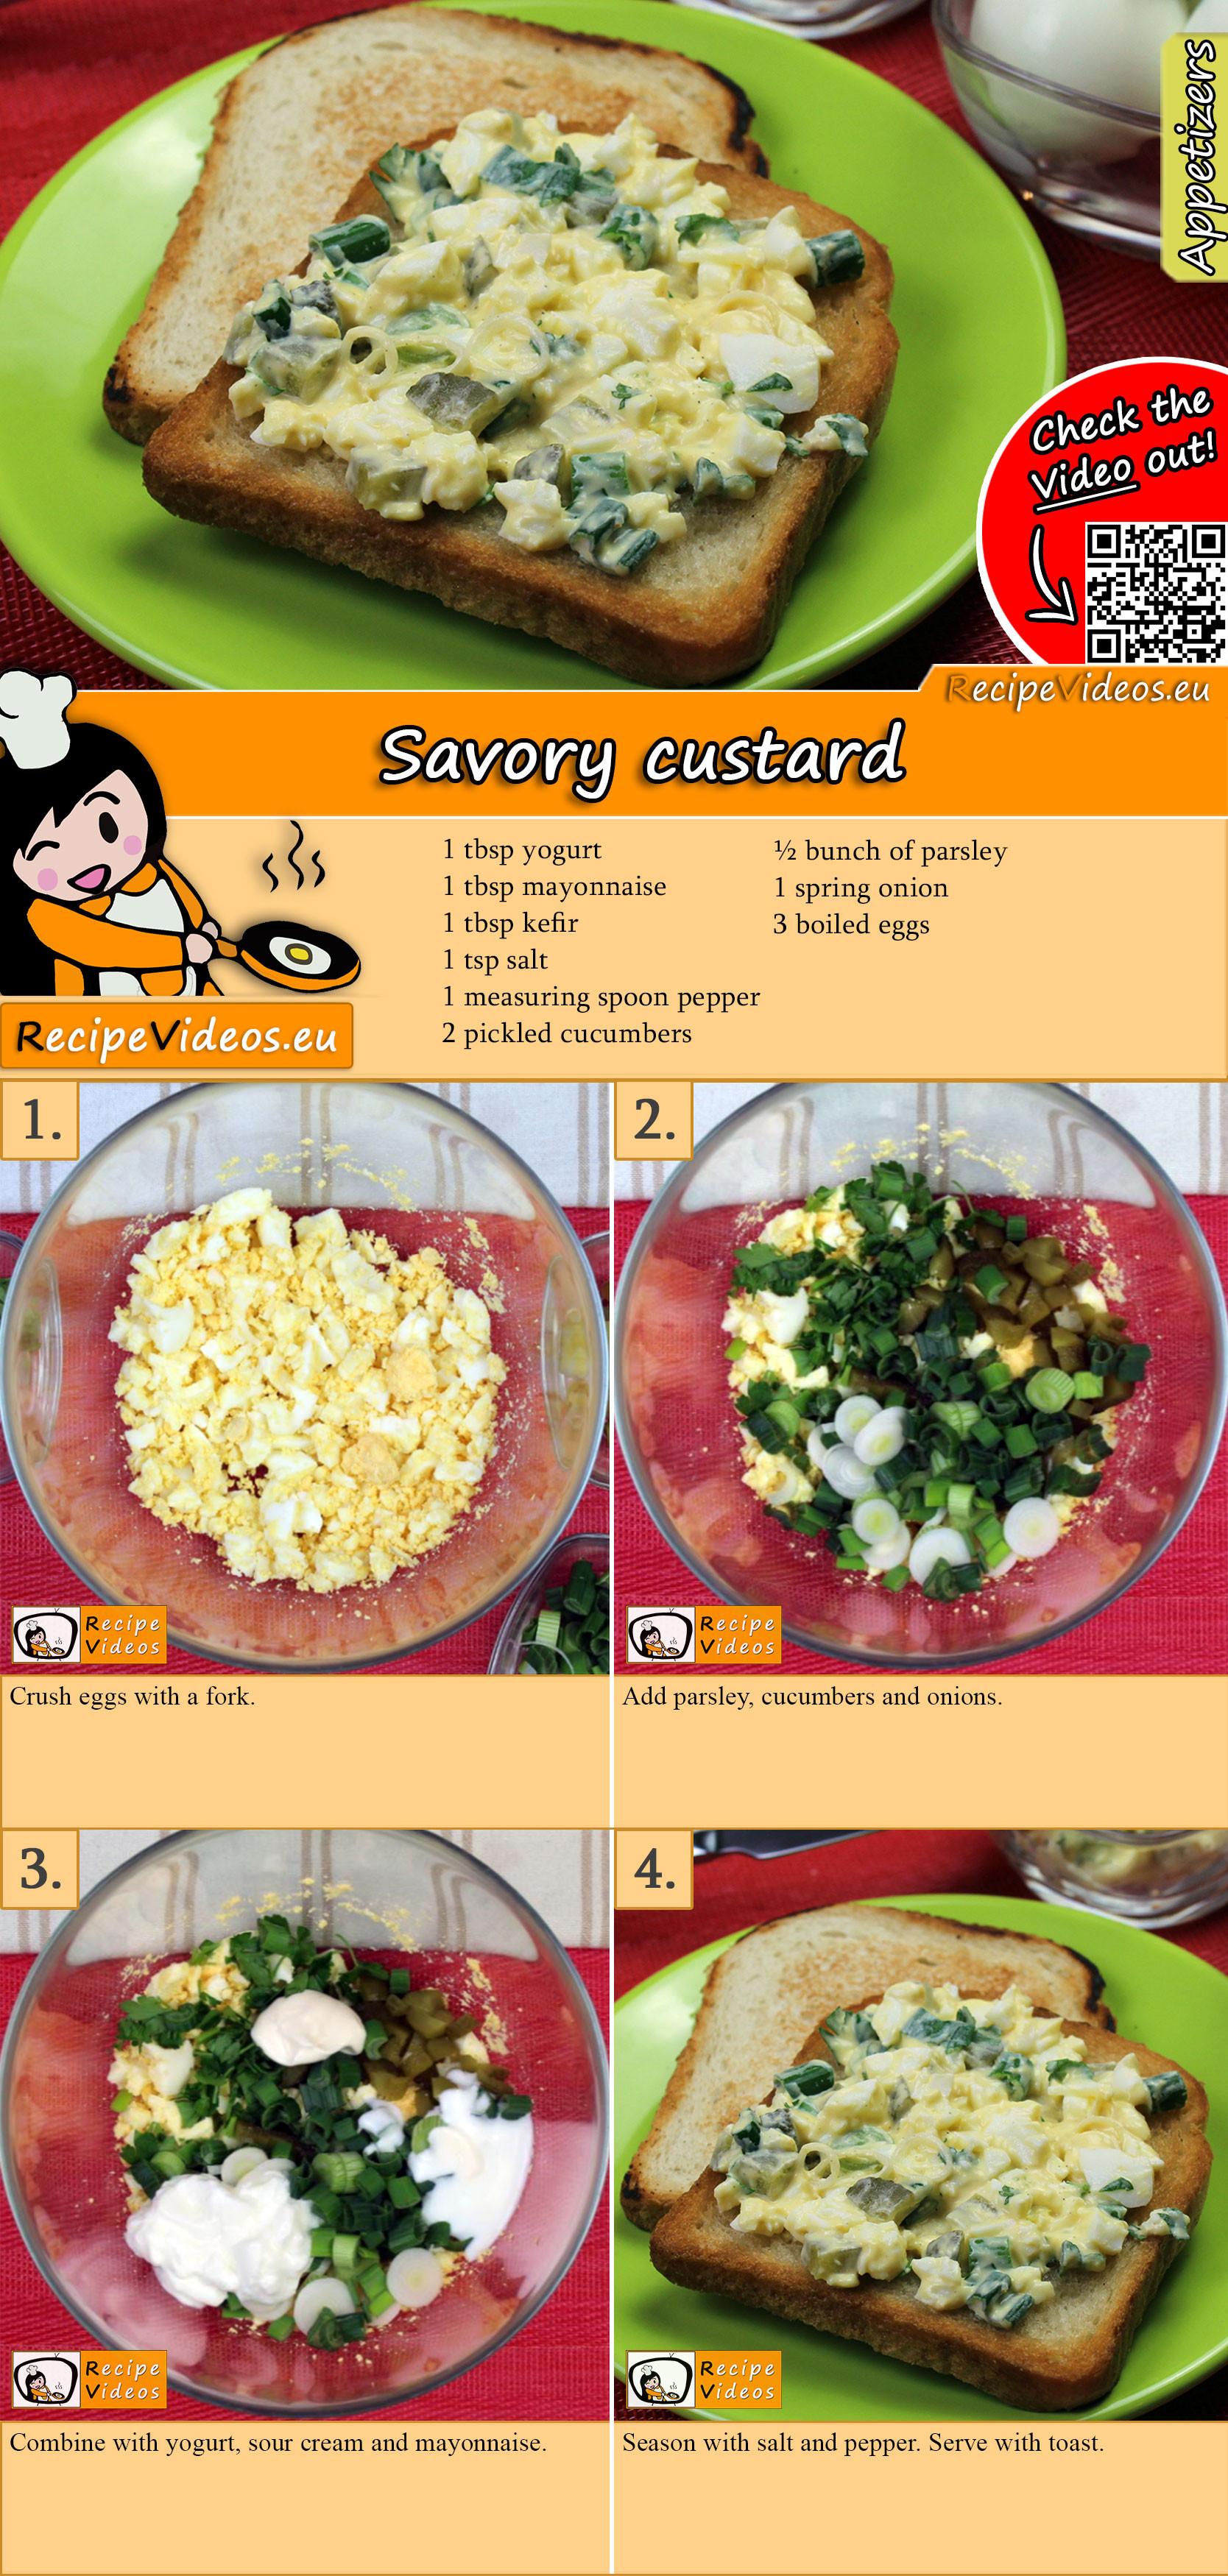 Savory custard recipe with video